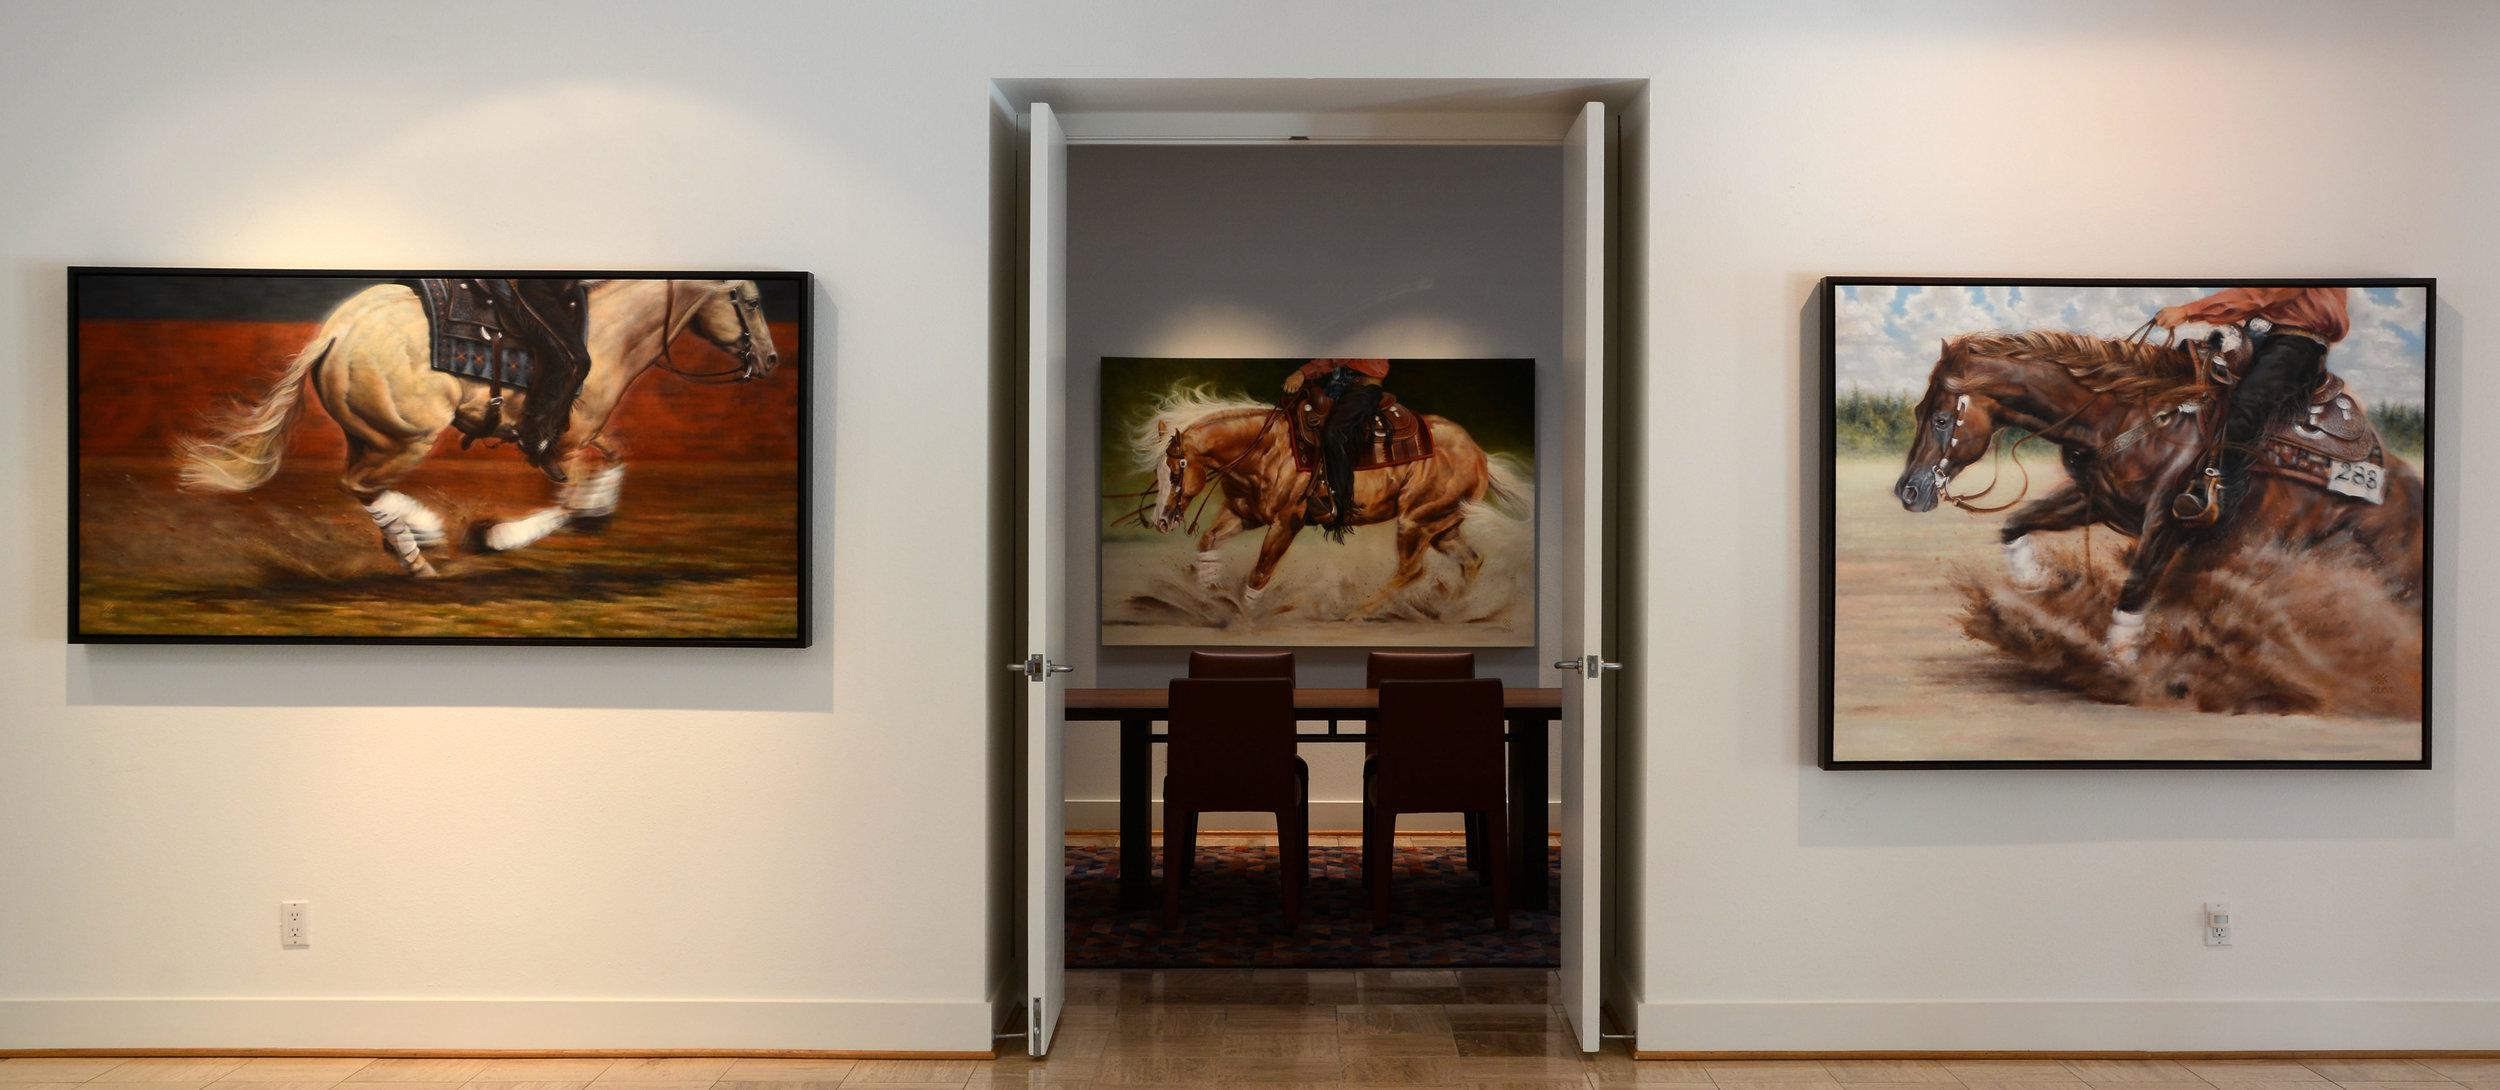 Interior display 3.JPG